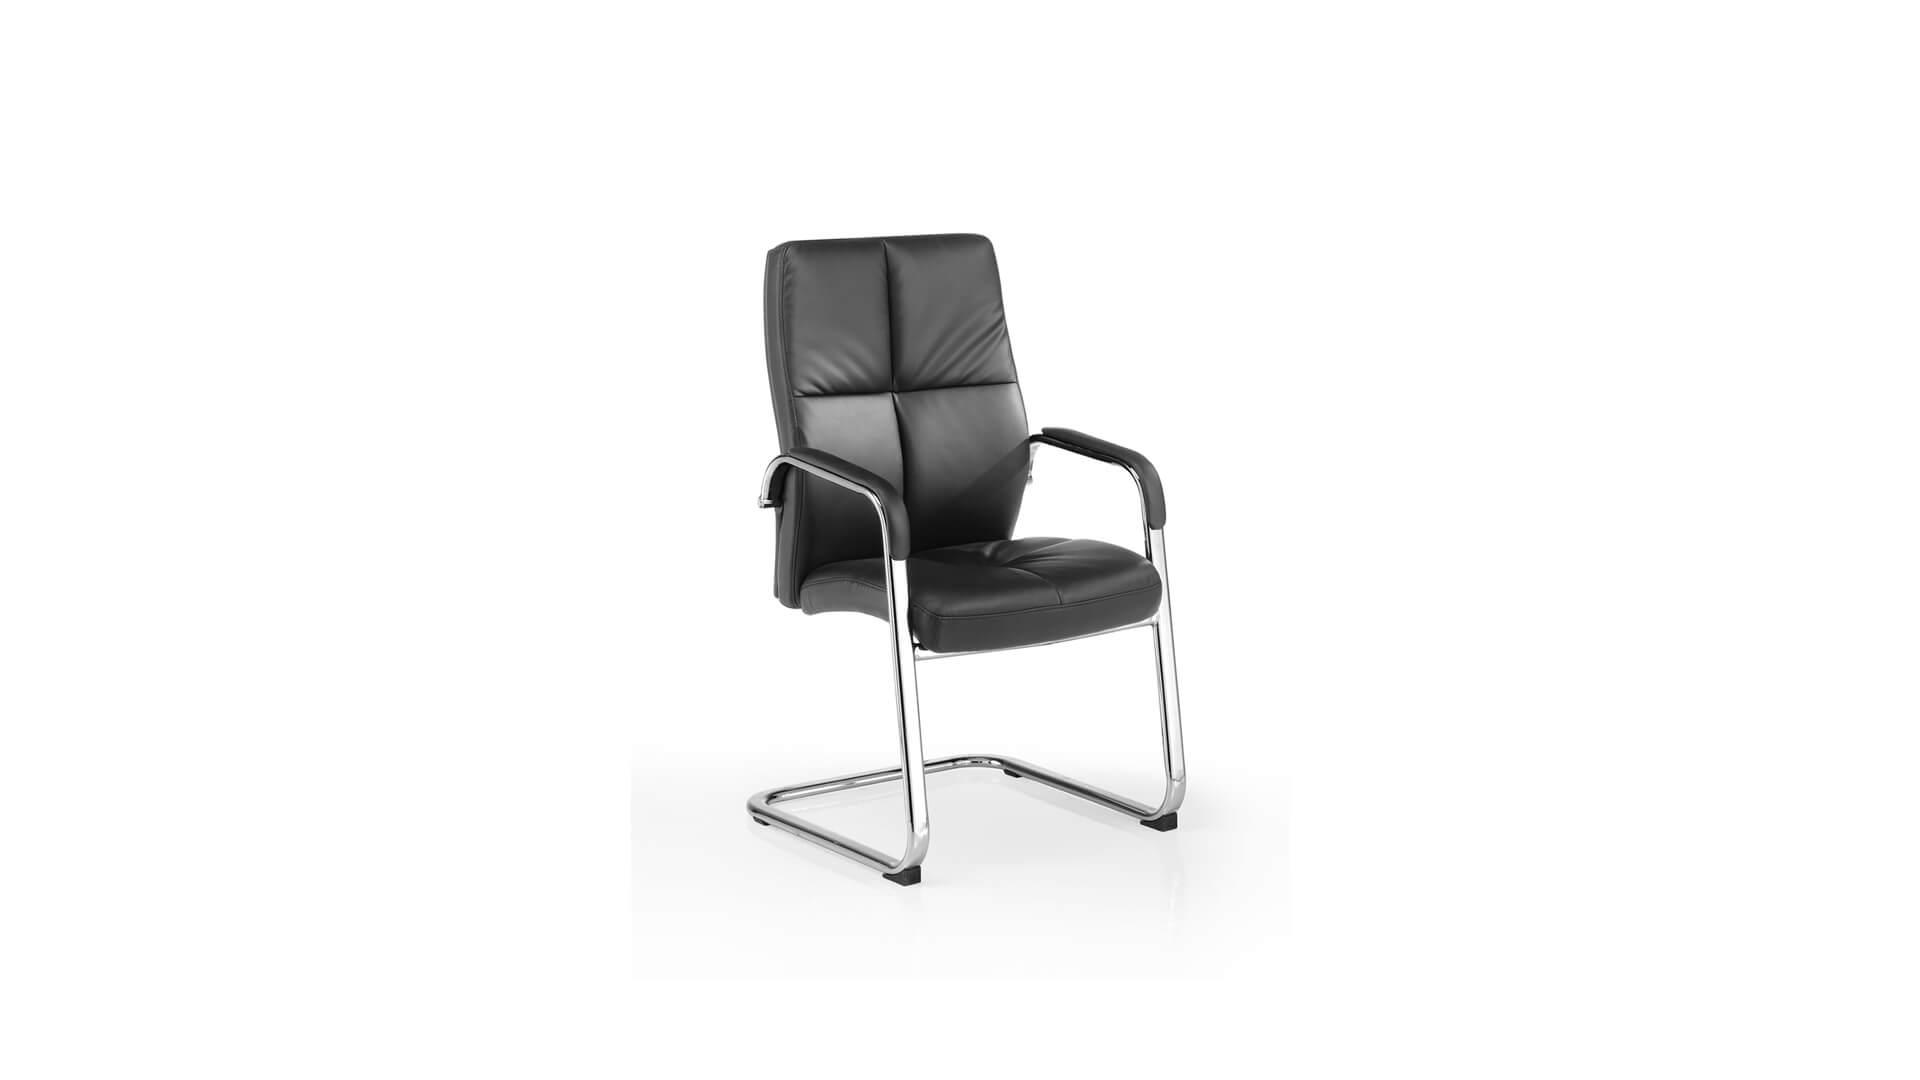 silla de confidente para despachos